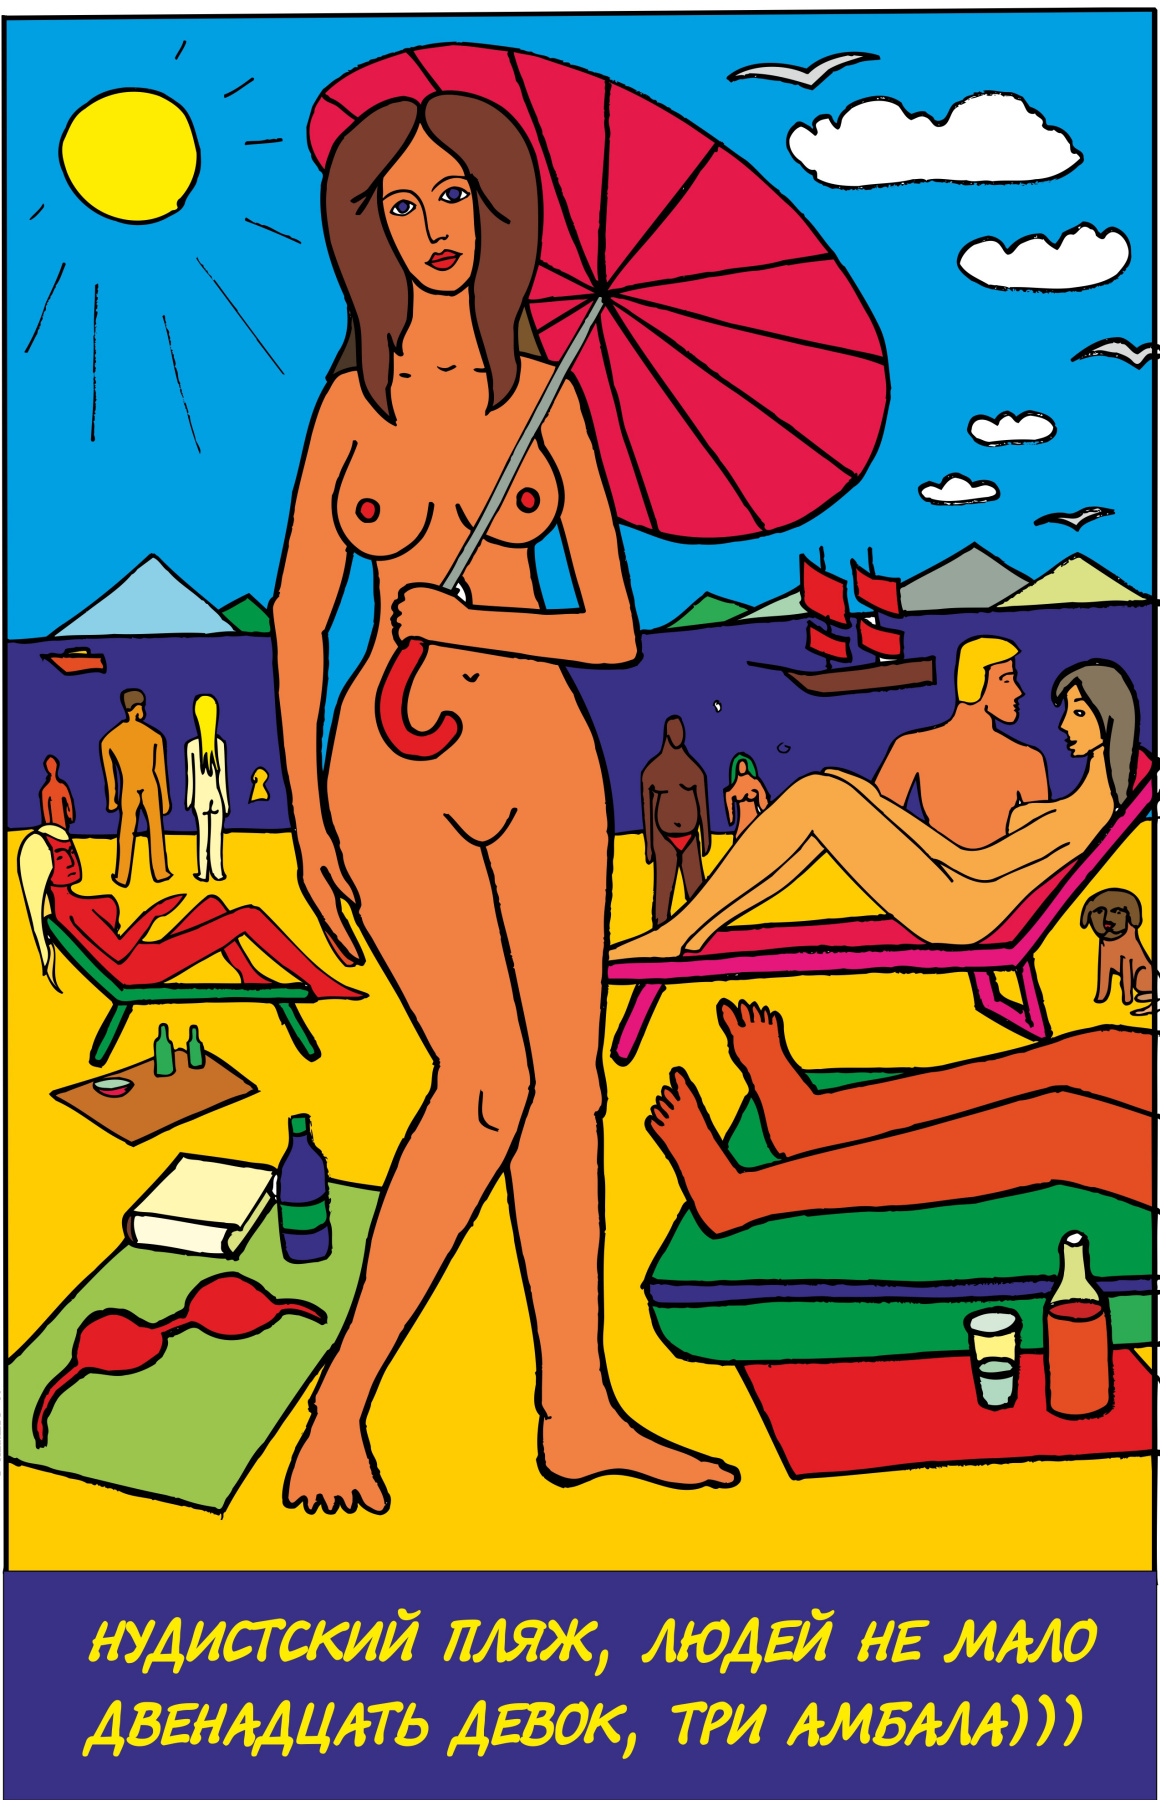 German iordanskii. Nudist beach